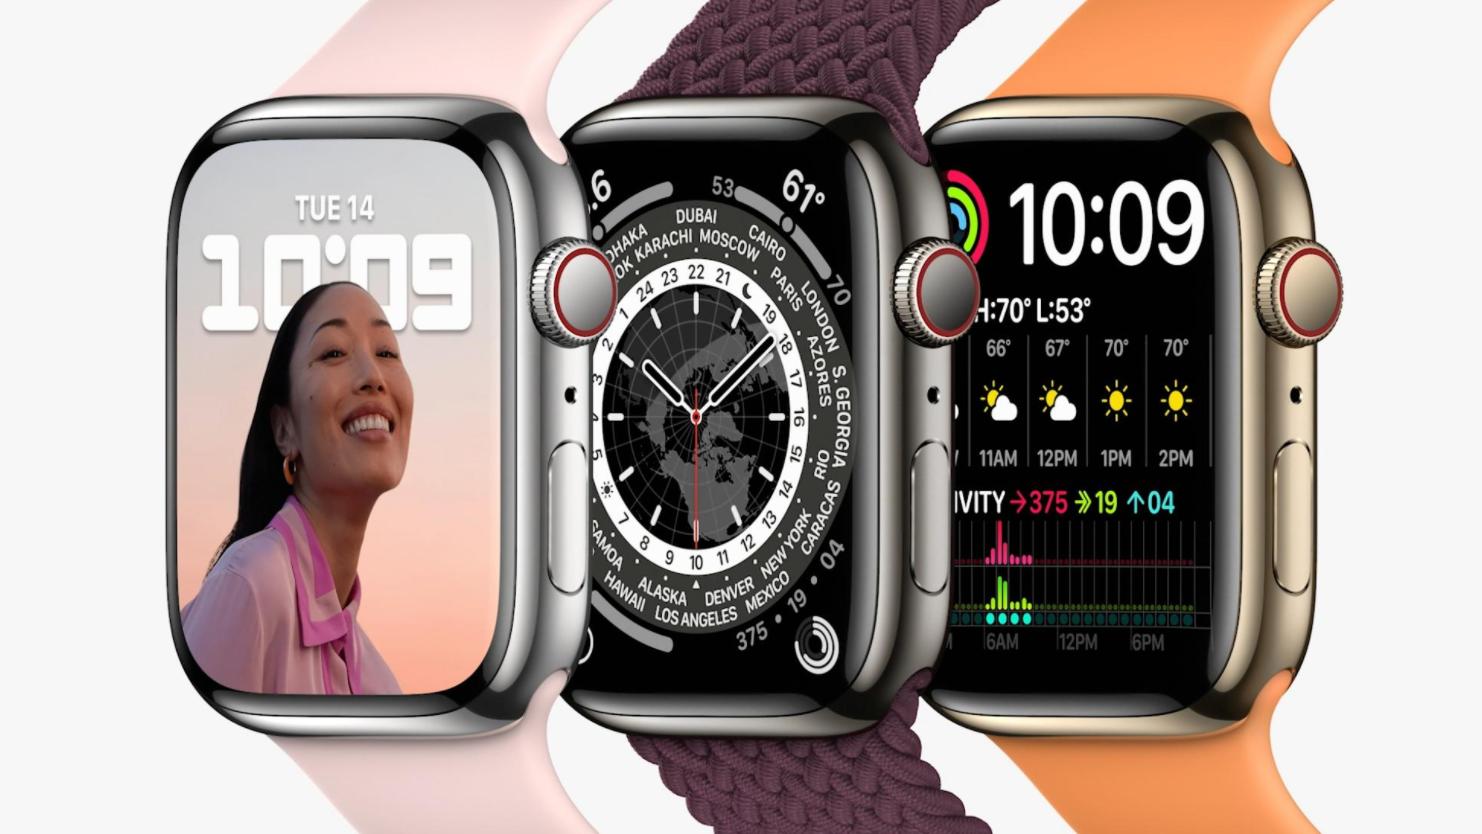 apple watch series 7续航_apple watch series 7续航时间多长